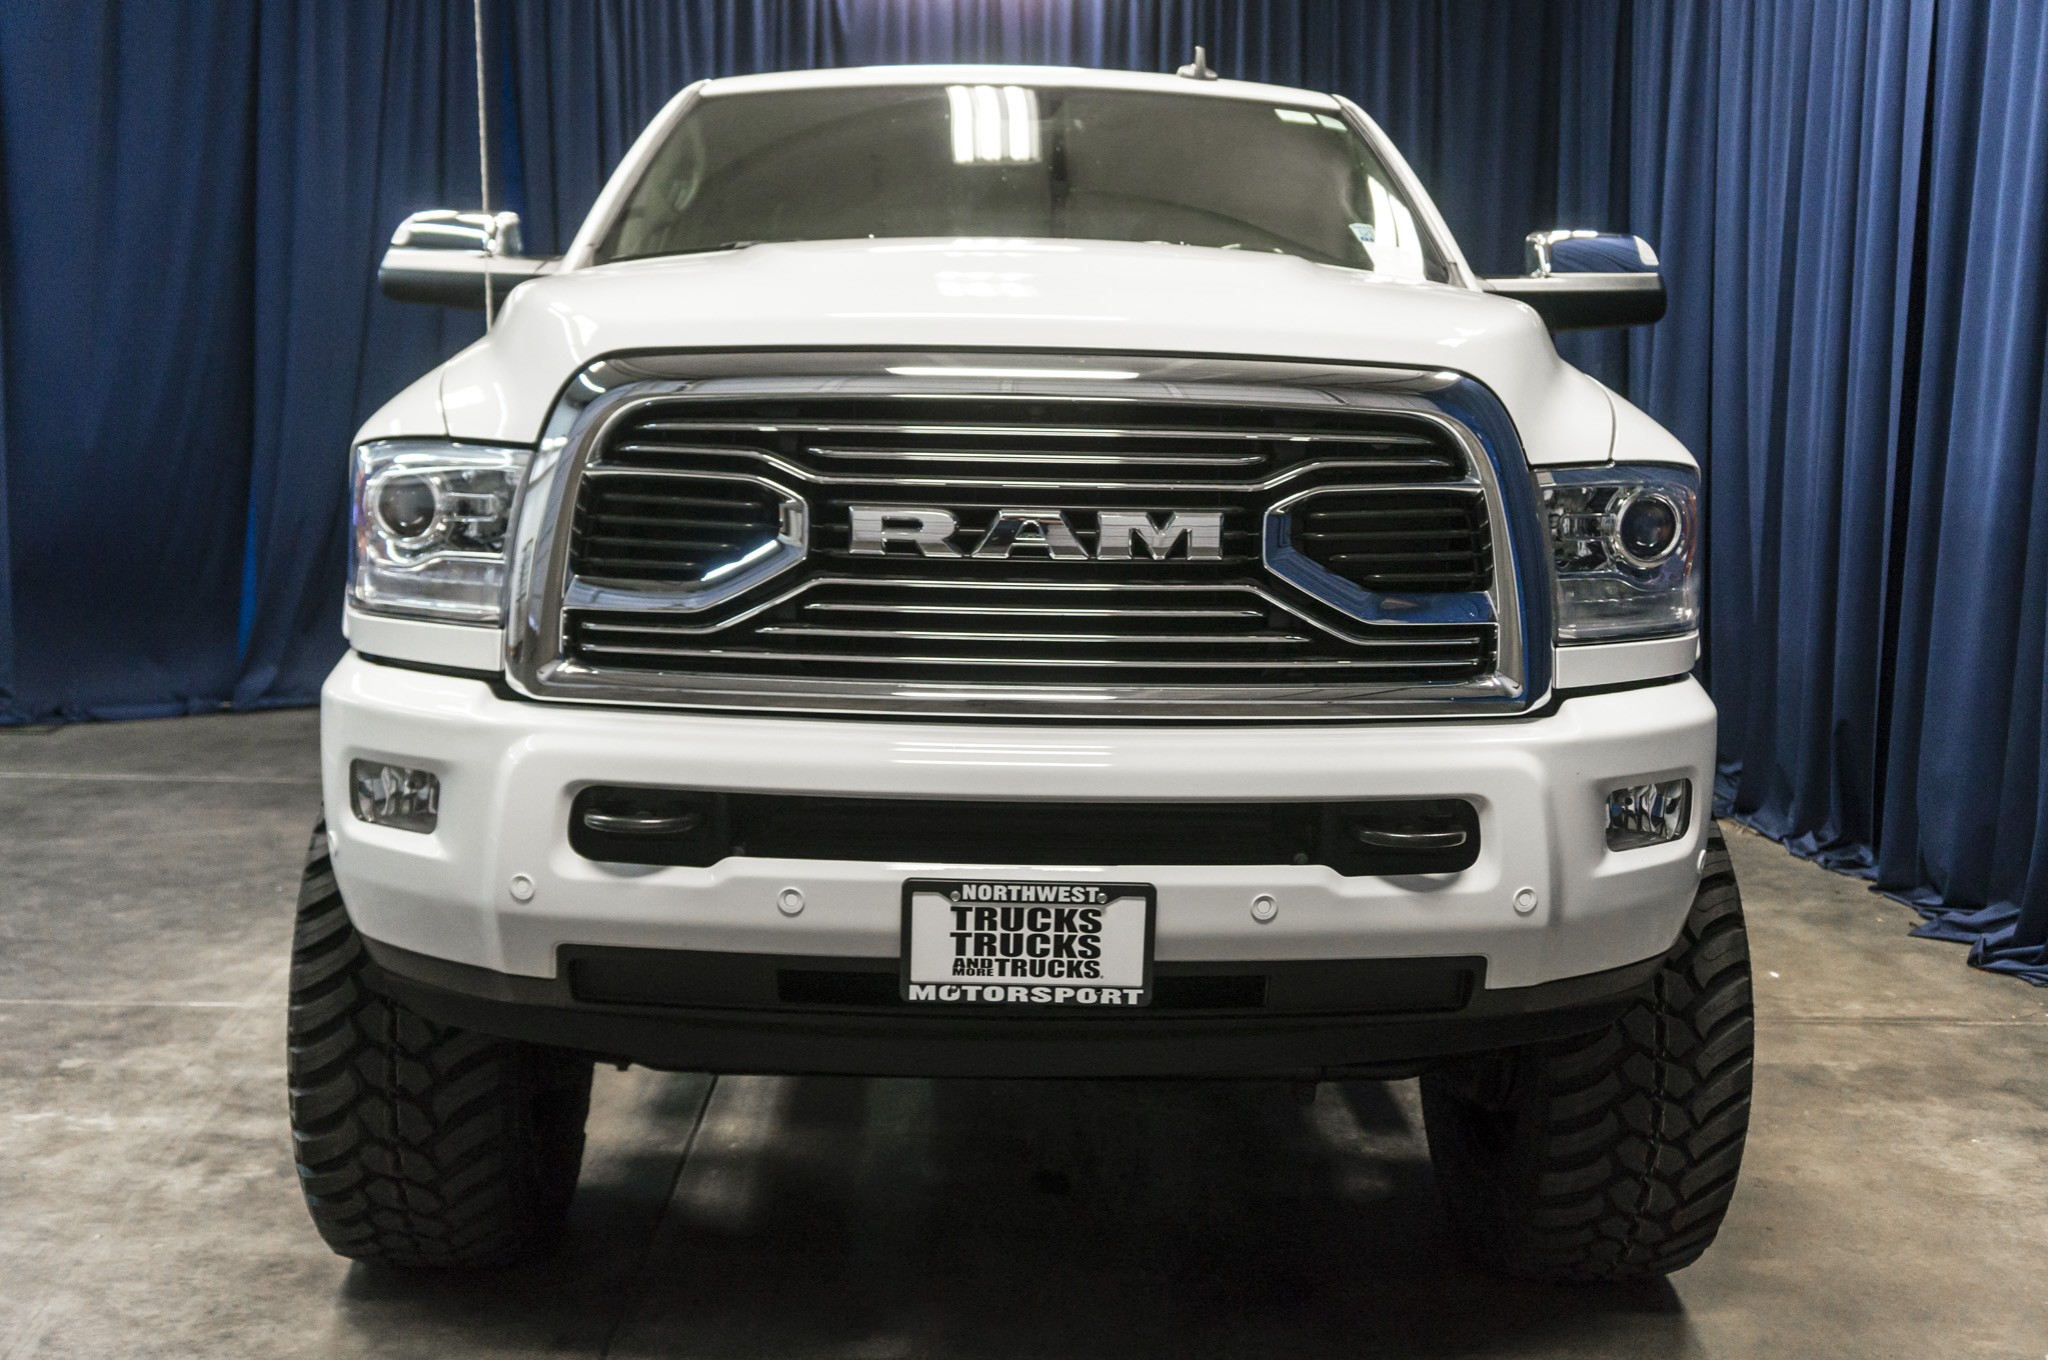 used lifted 2016 dodge ram 3500 limited 4x4 diesel truck for sale 35485. Black Bedroom Furniture Sets. Home Design Ideas